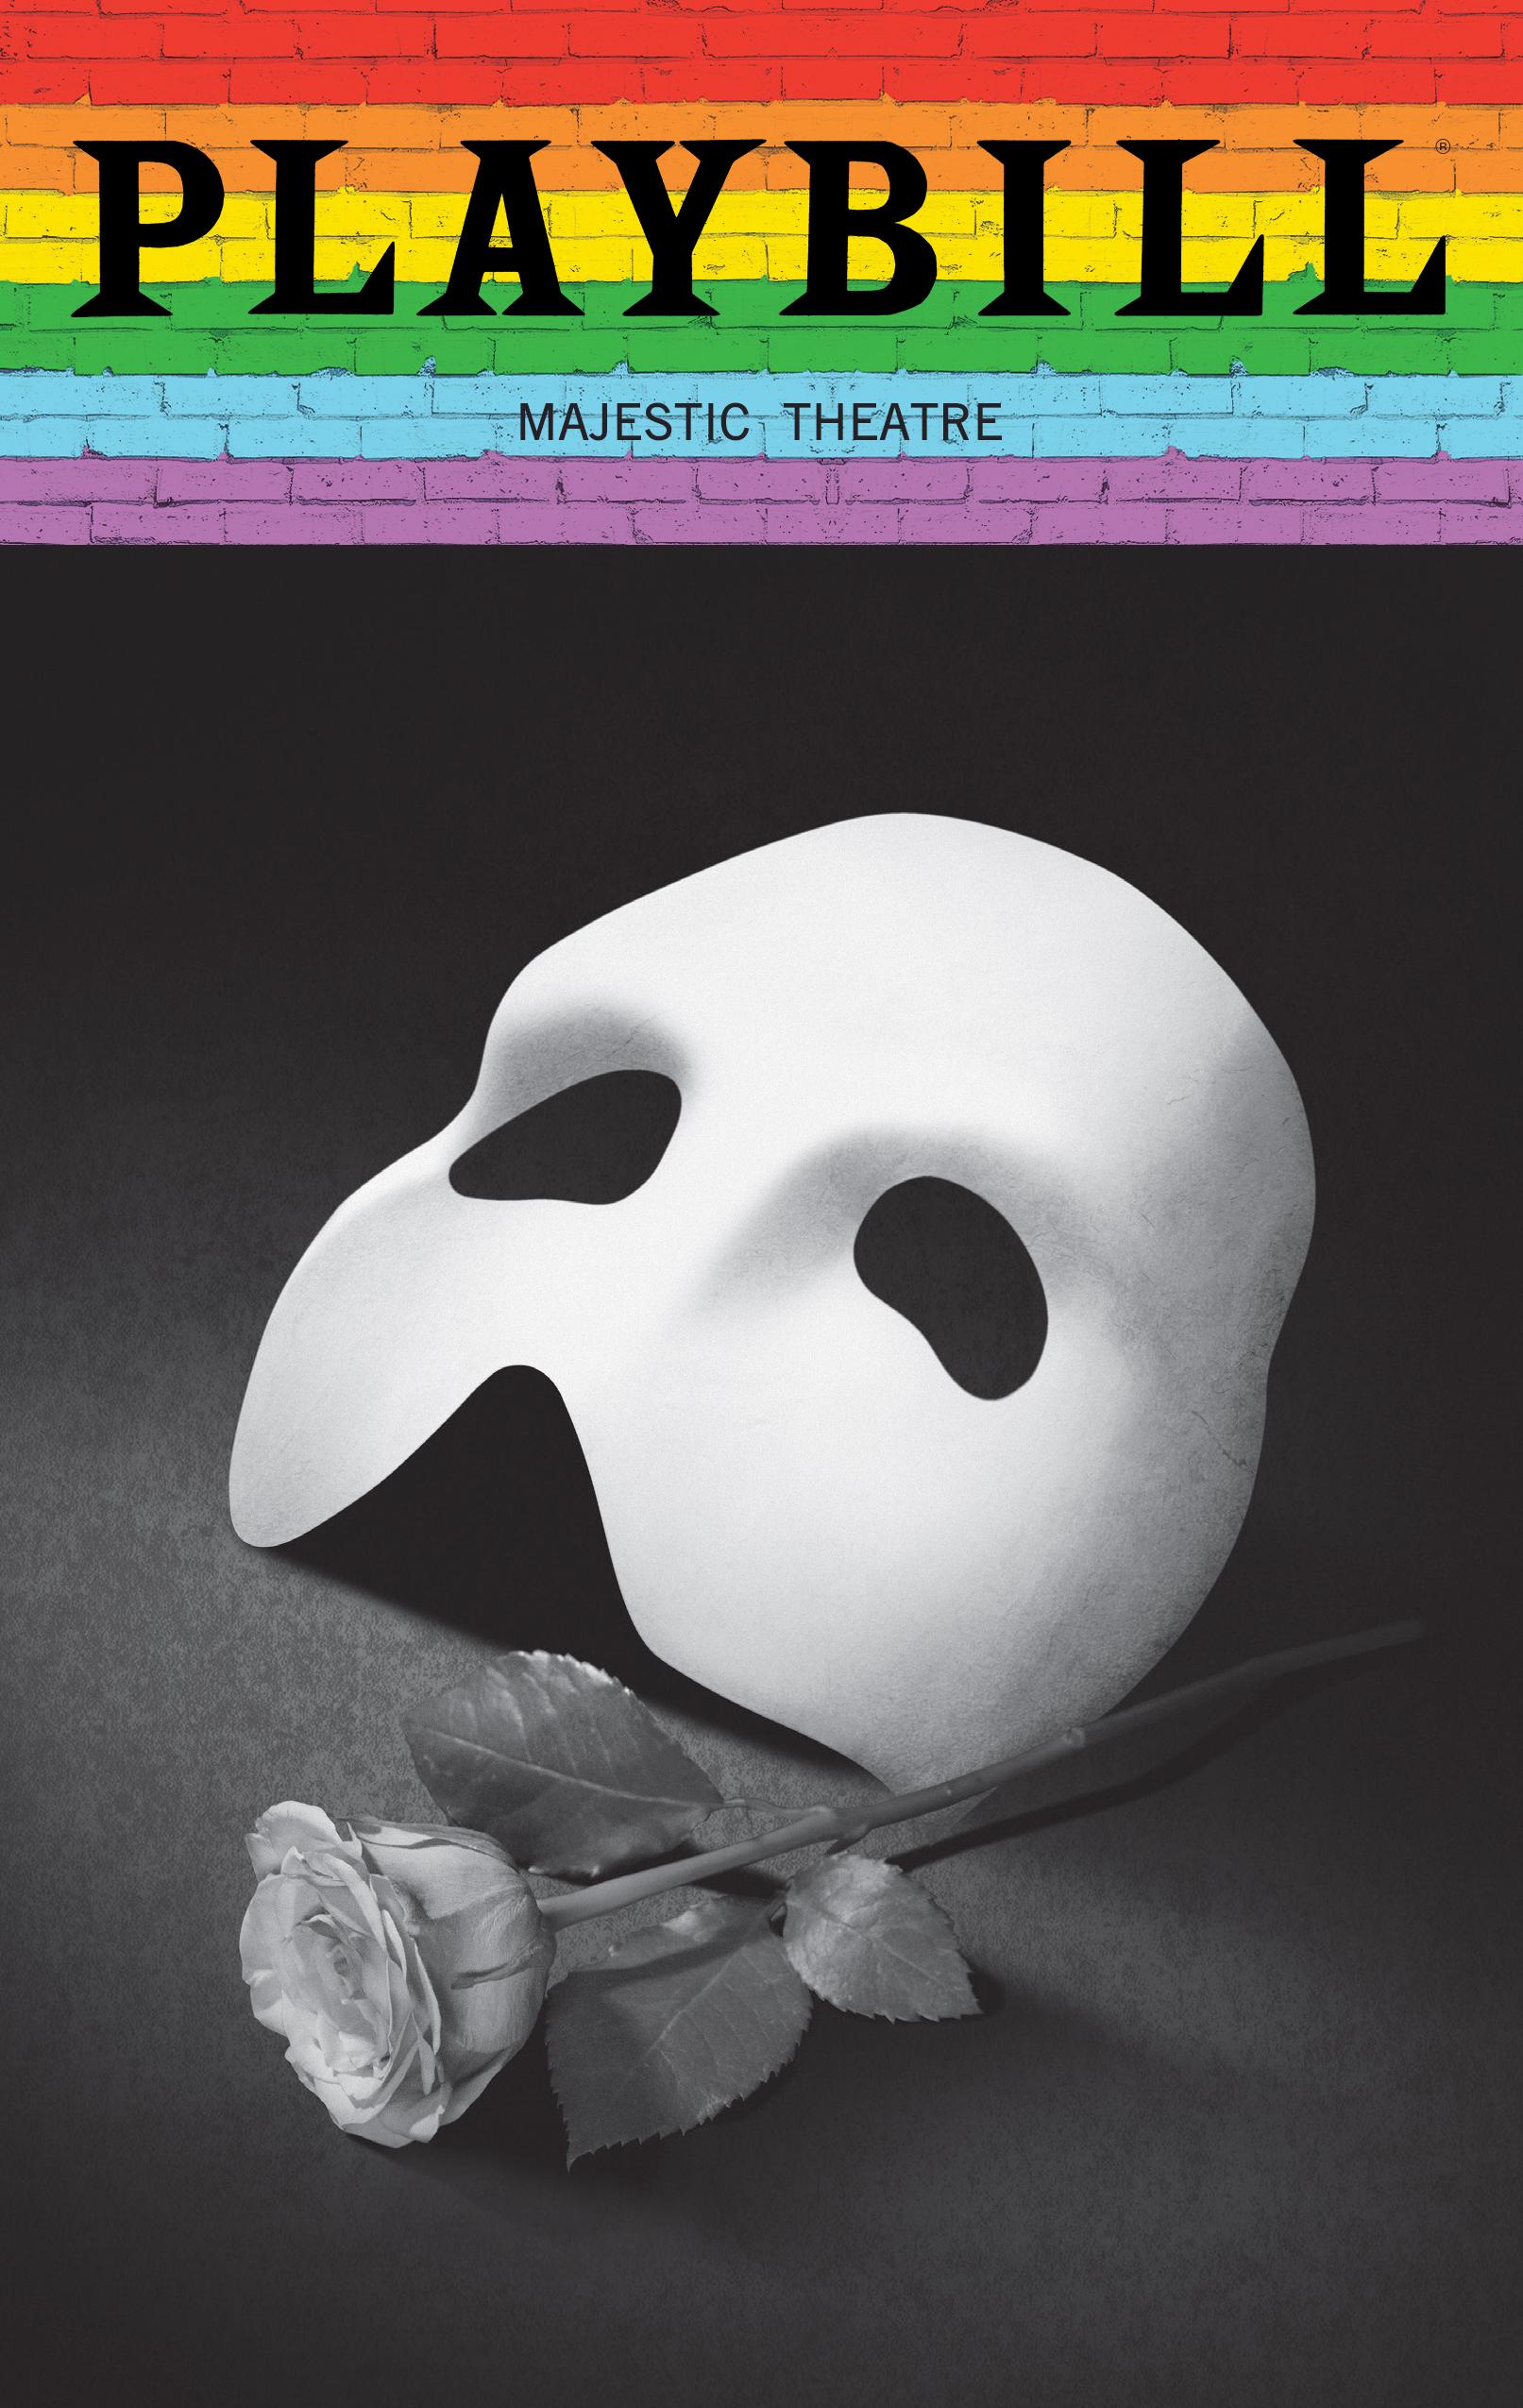 The Phantom Of The Opera June 2019 Playbill With Rainbow